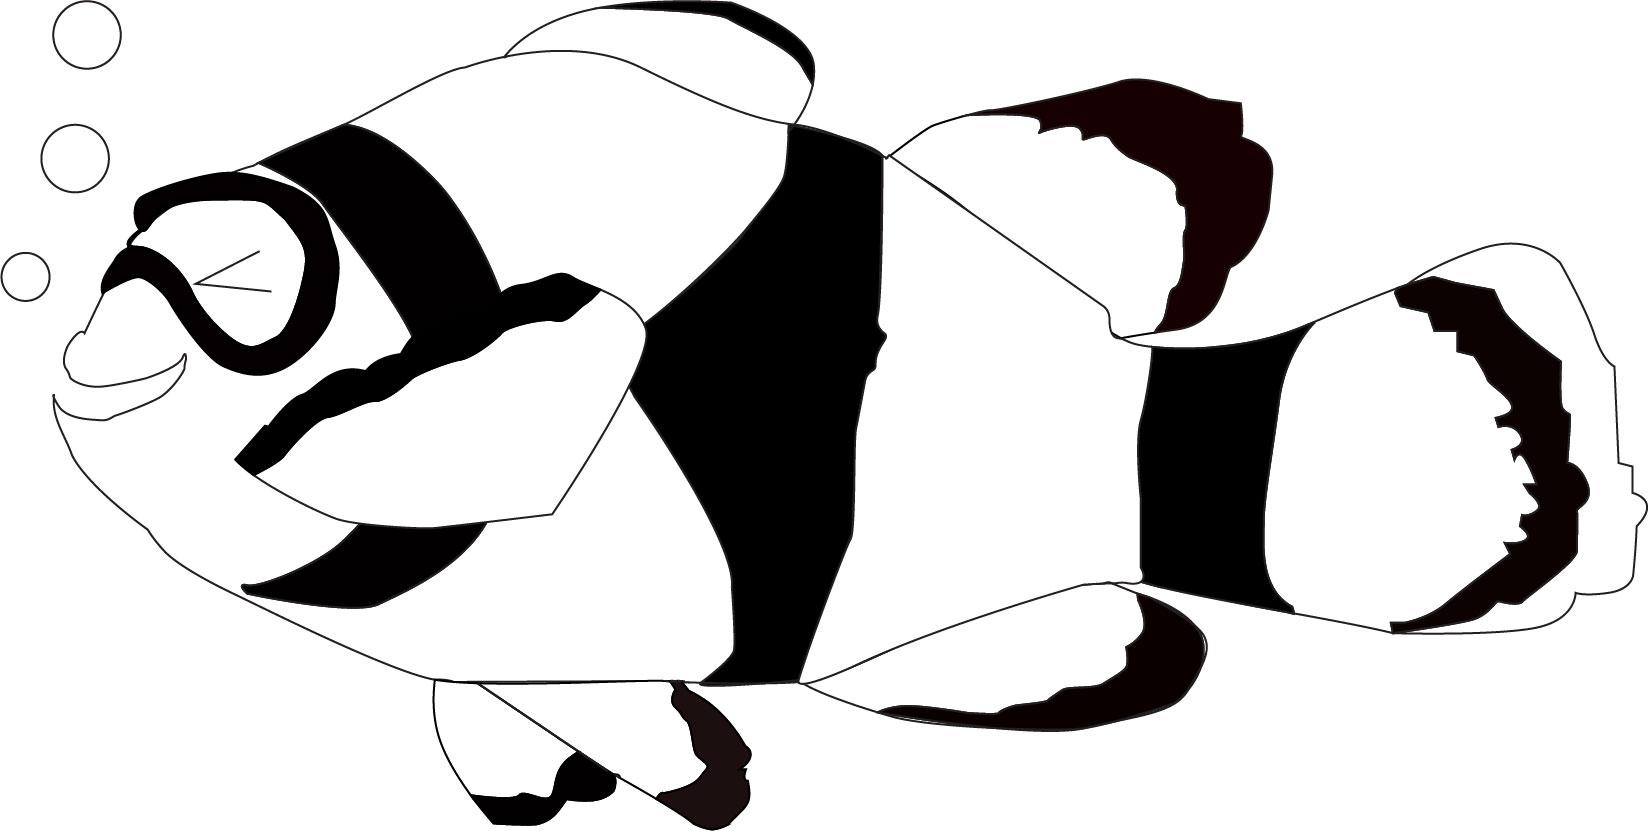 clown-fish-illustration.jpg